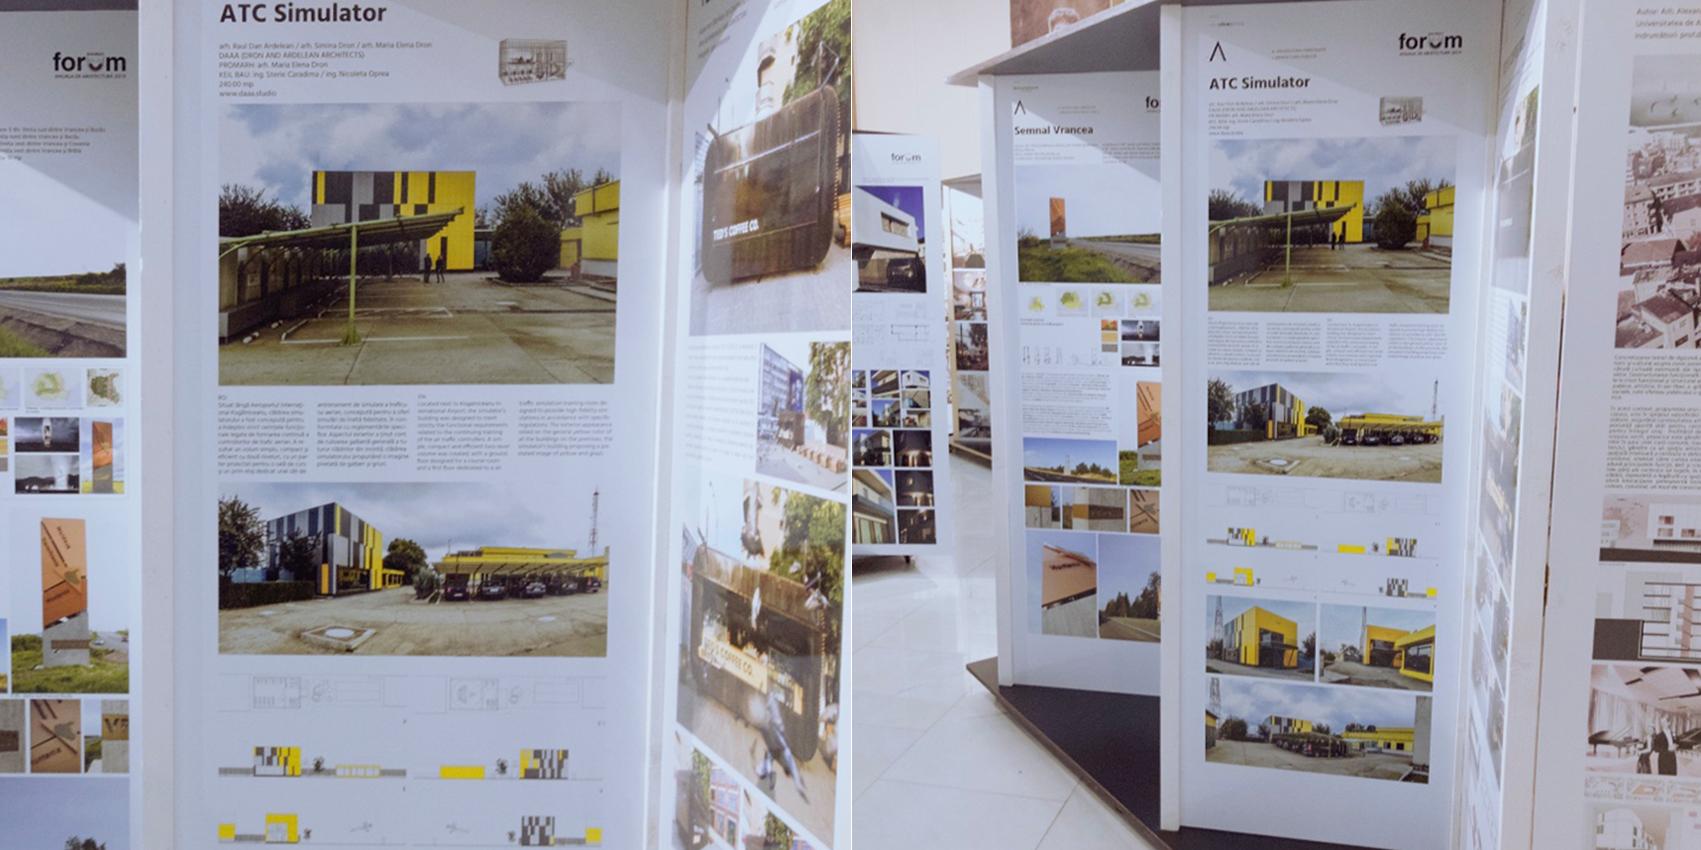 ATC SIMULATOR presented at The Bucharest Architecture Annual / Anuala de Arhitectură București 2019 in the Public Architecture category - ATC Simulator project was presented in AAB 2019 exhibition in the Public Architecture category.More details here:https://www.anuala.roAnd here:https://www.anuala.ro/proiecte/2019/206/